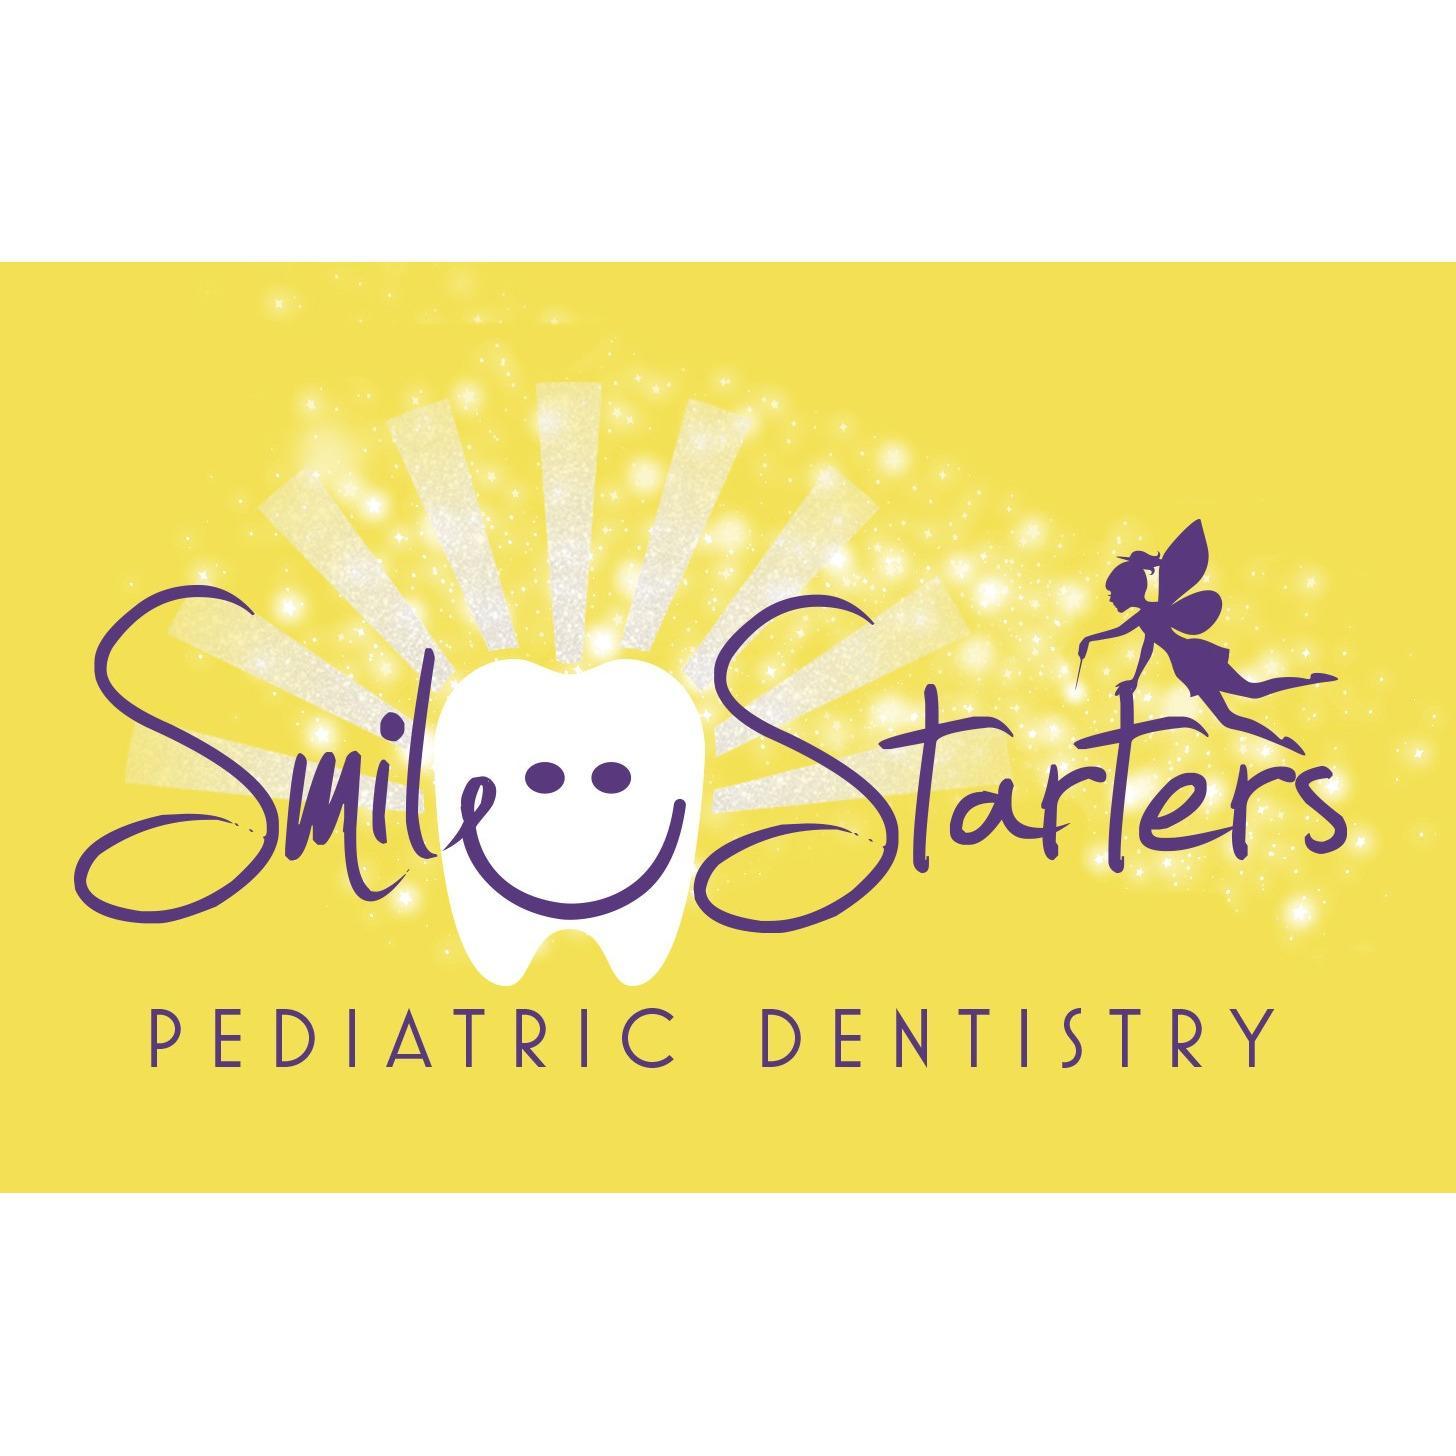 Eileen Dano Calamia - Smile Starter Pediatric Dentistry